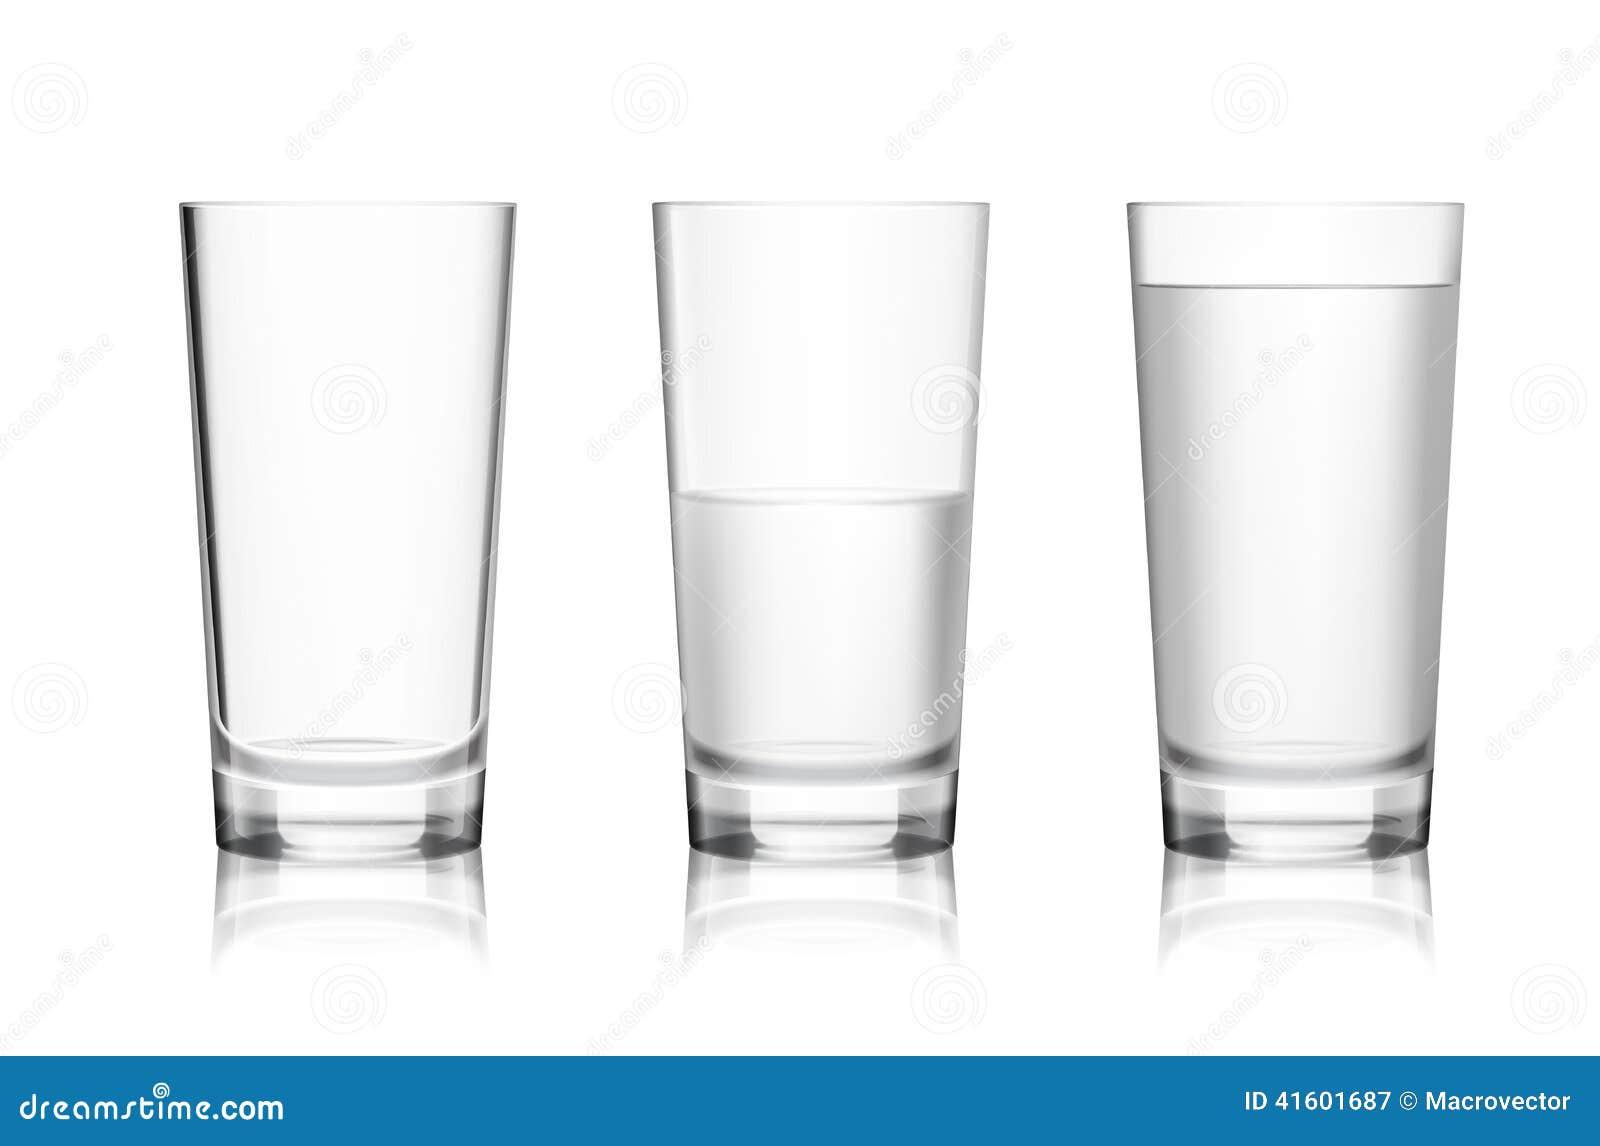 Glas leer clipart  Volles Und Leeres Glas Vektor Abbildung - Bild: 41601687